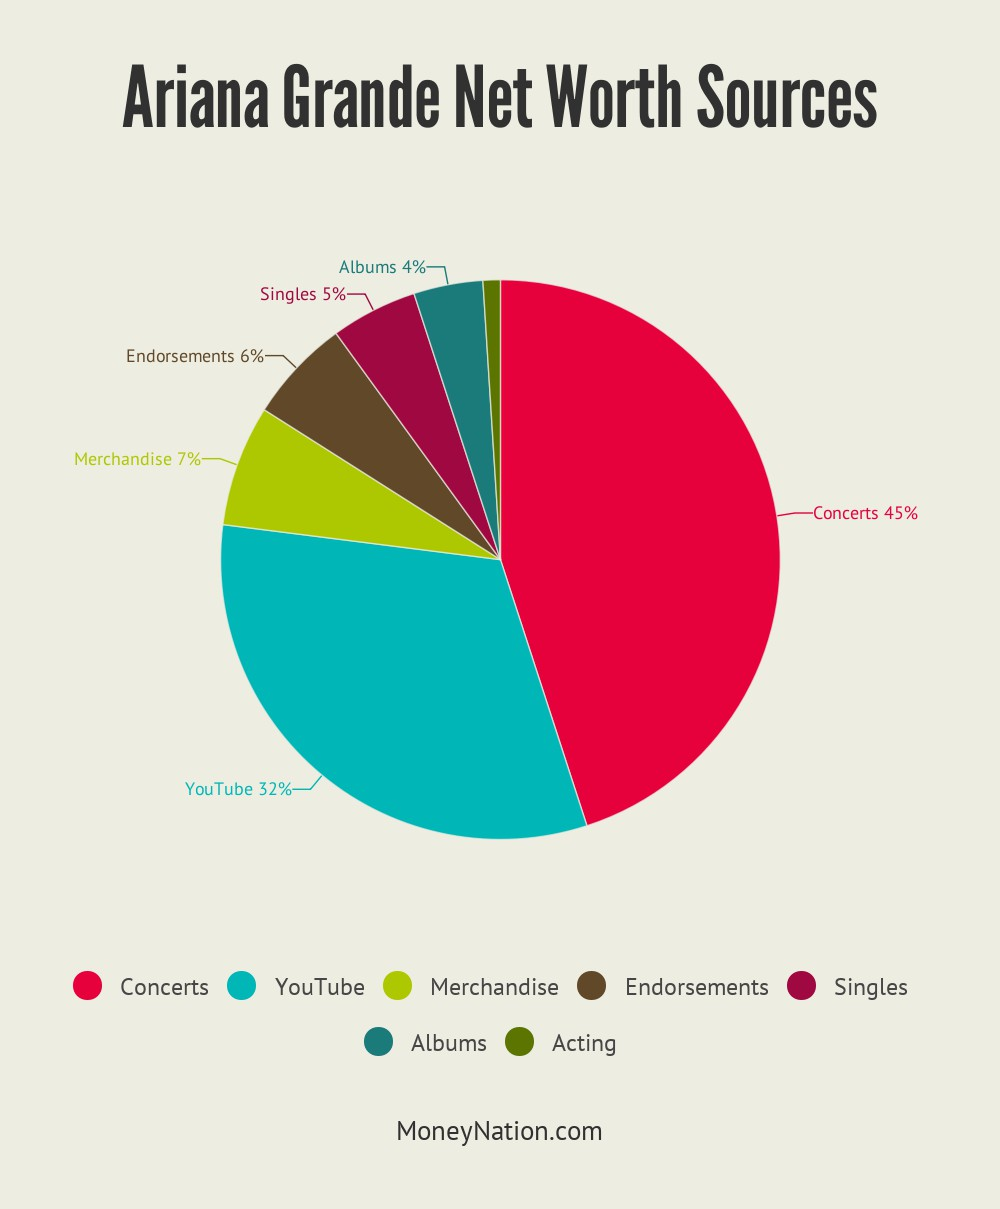 Ariana Grande Net Worth Sources